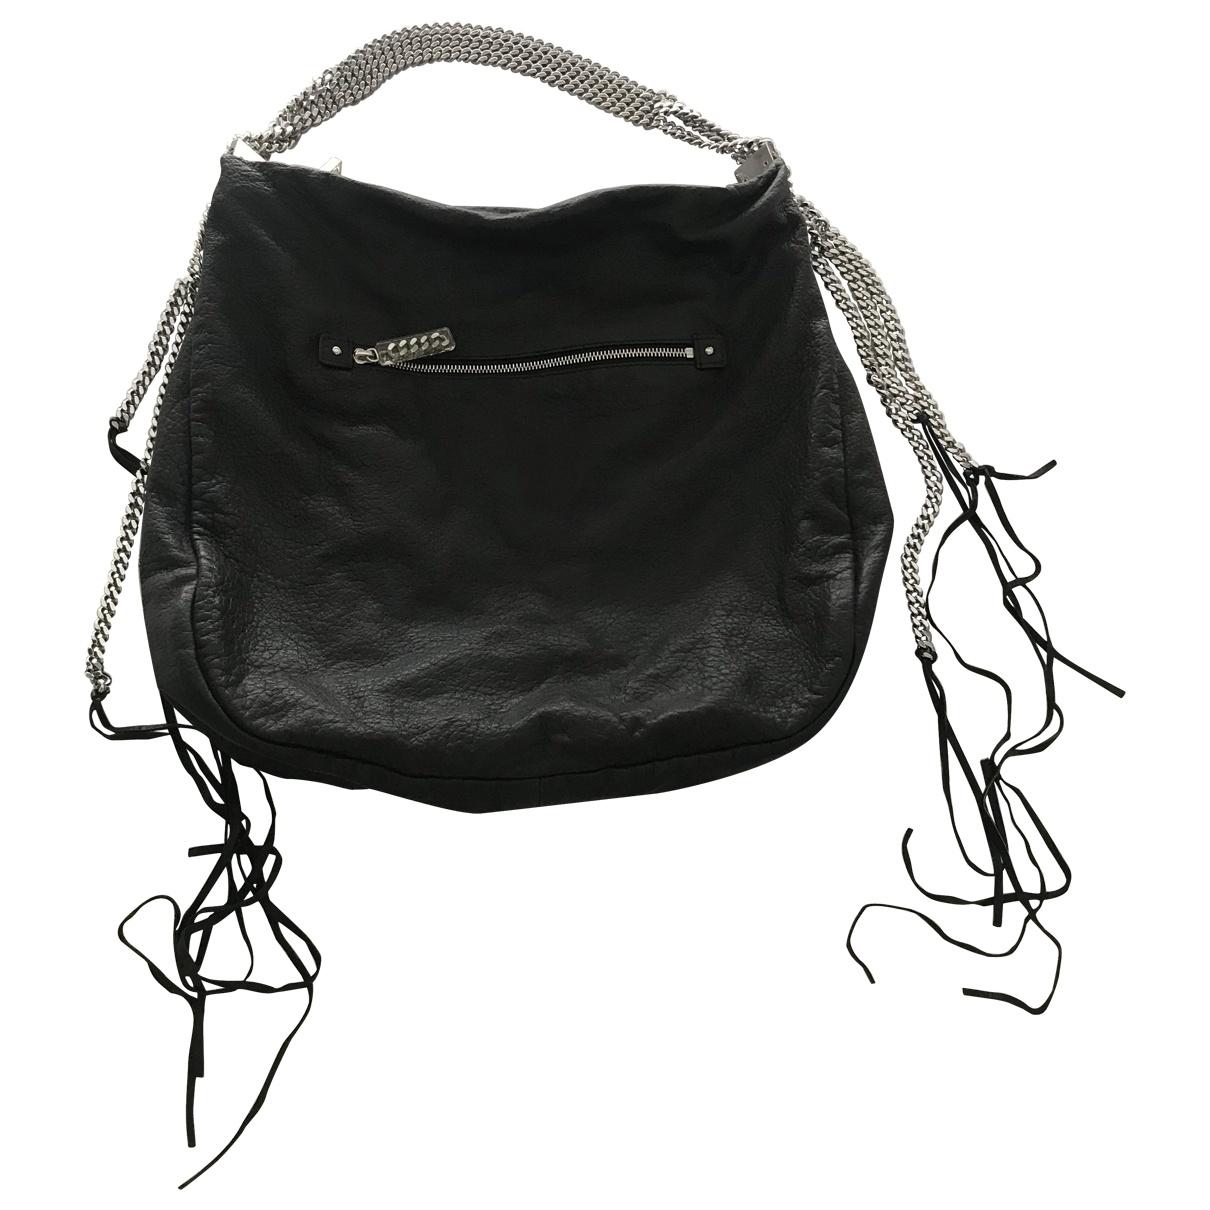 Christian Louboutin \N Black Leather handbag for Women \N